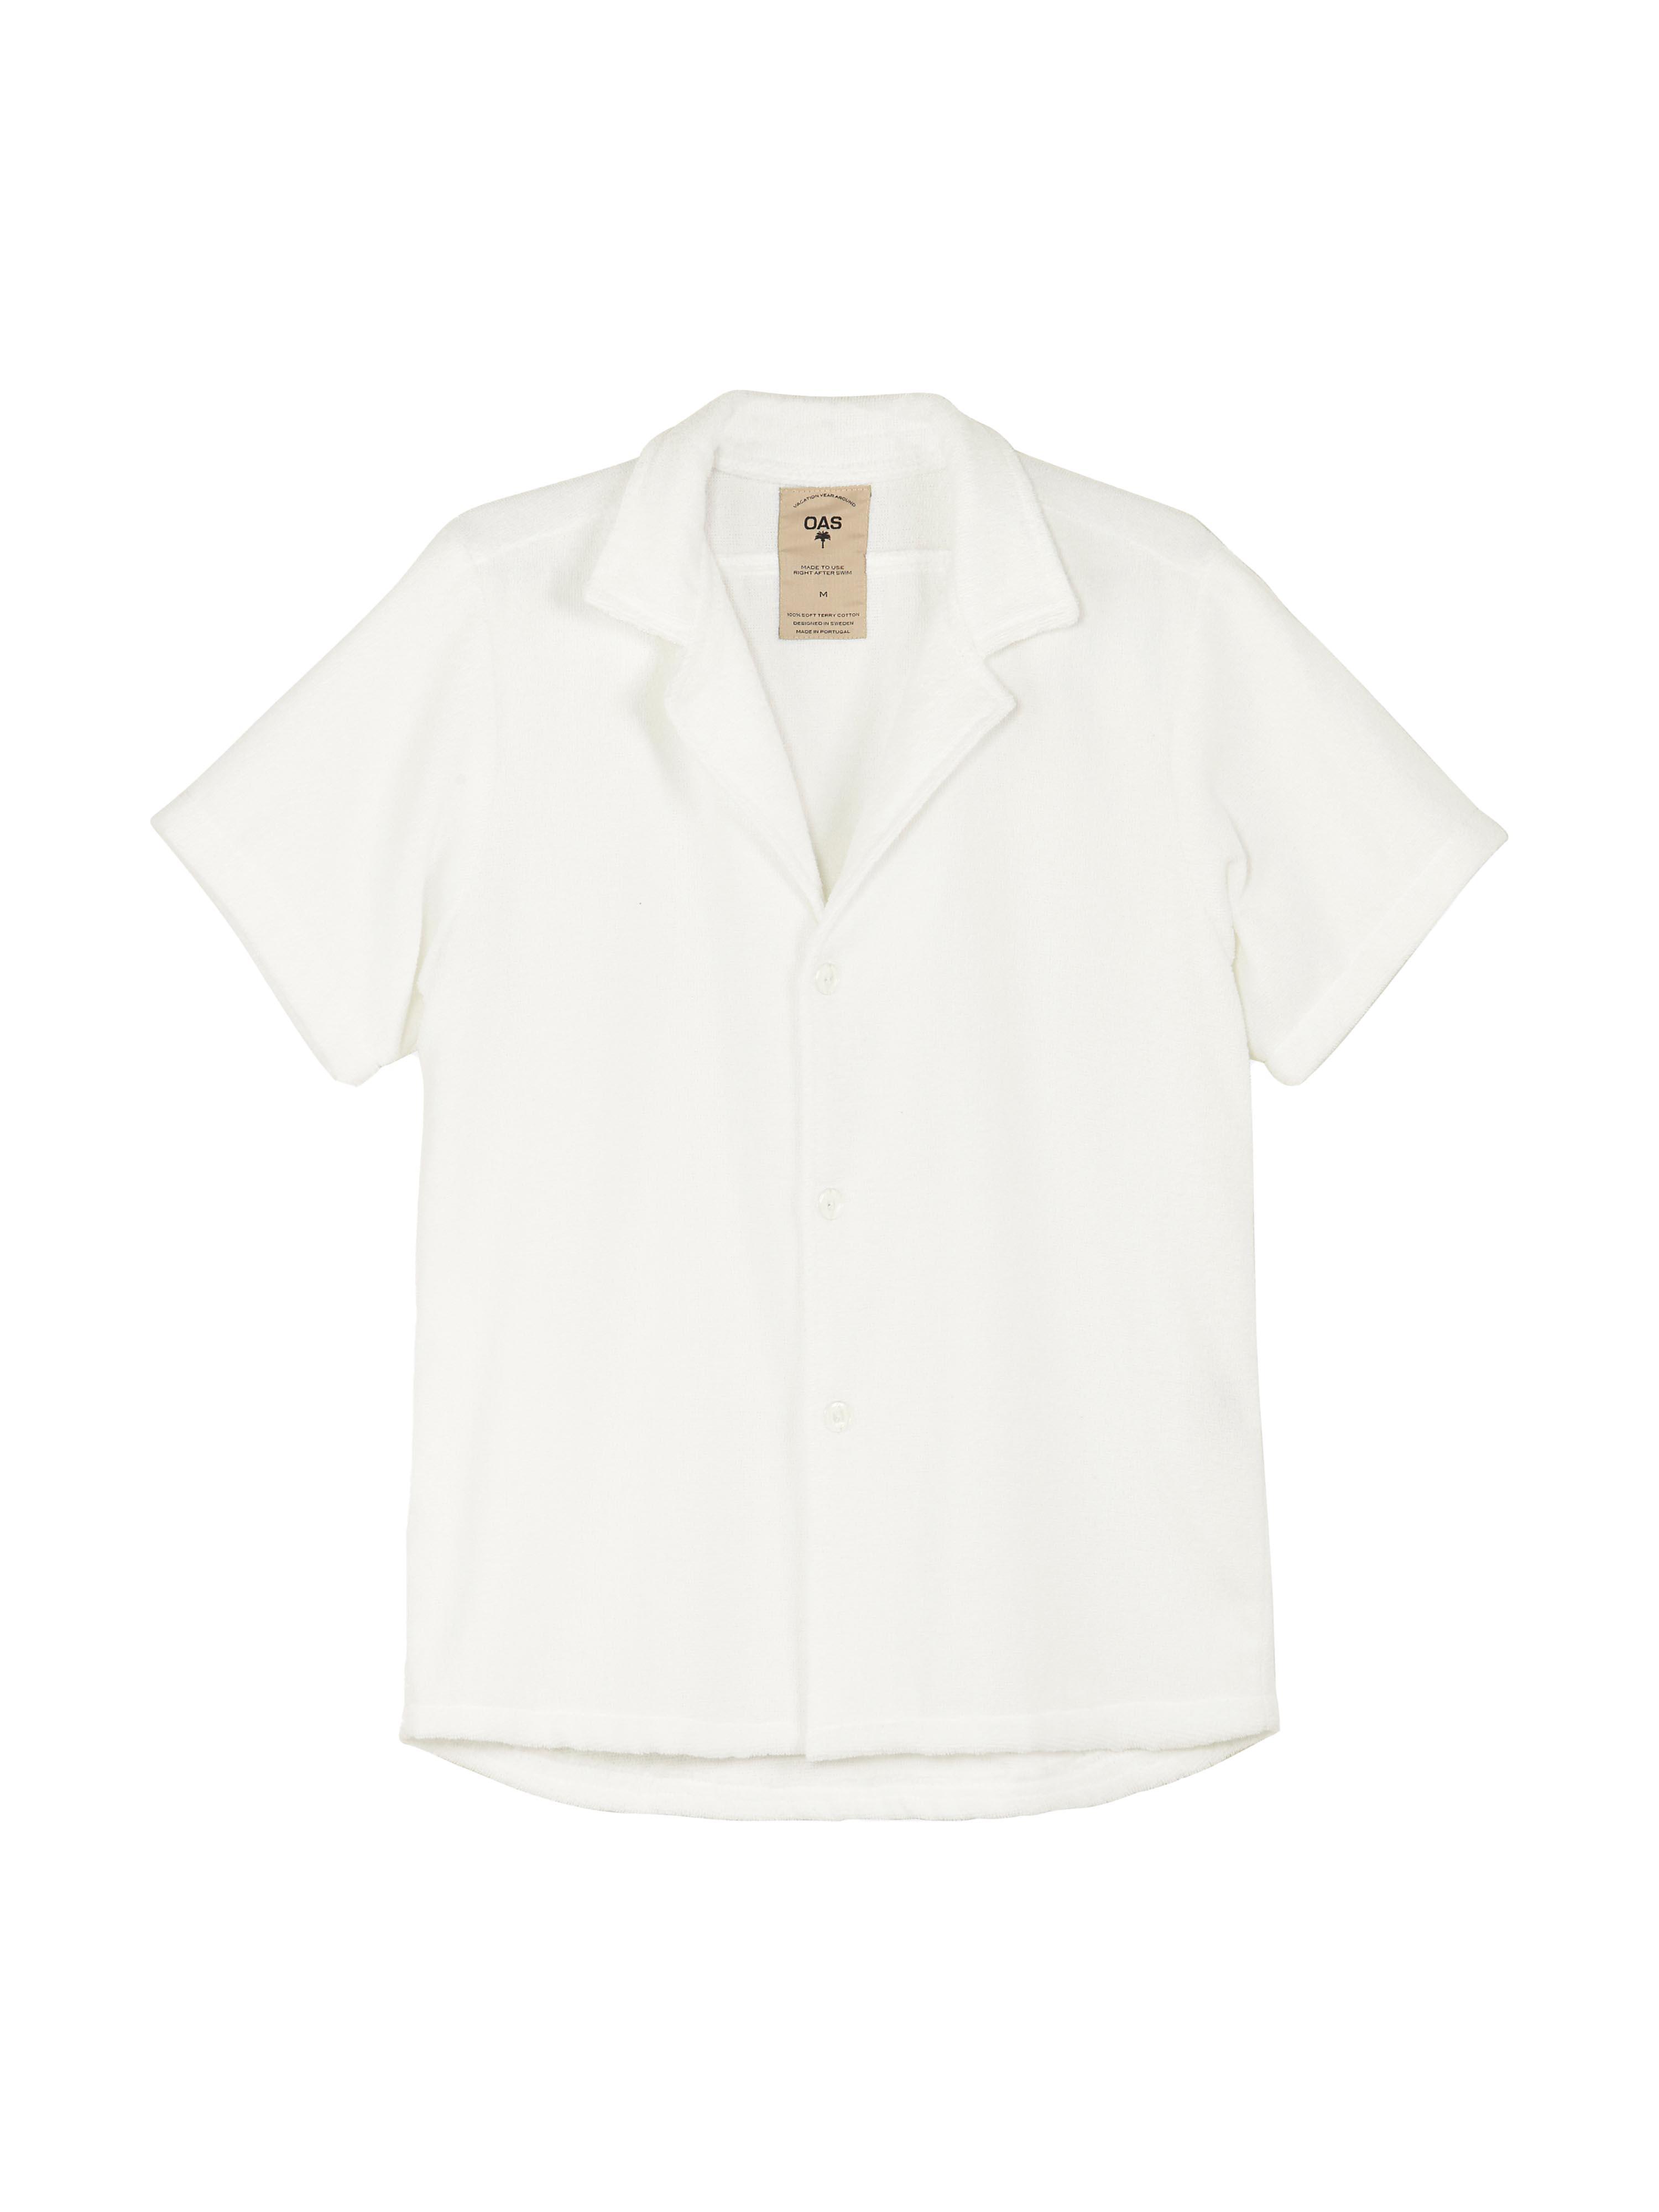 White Cuba Terry Shirt